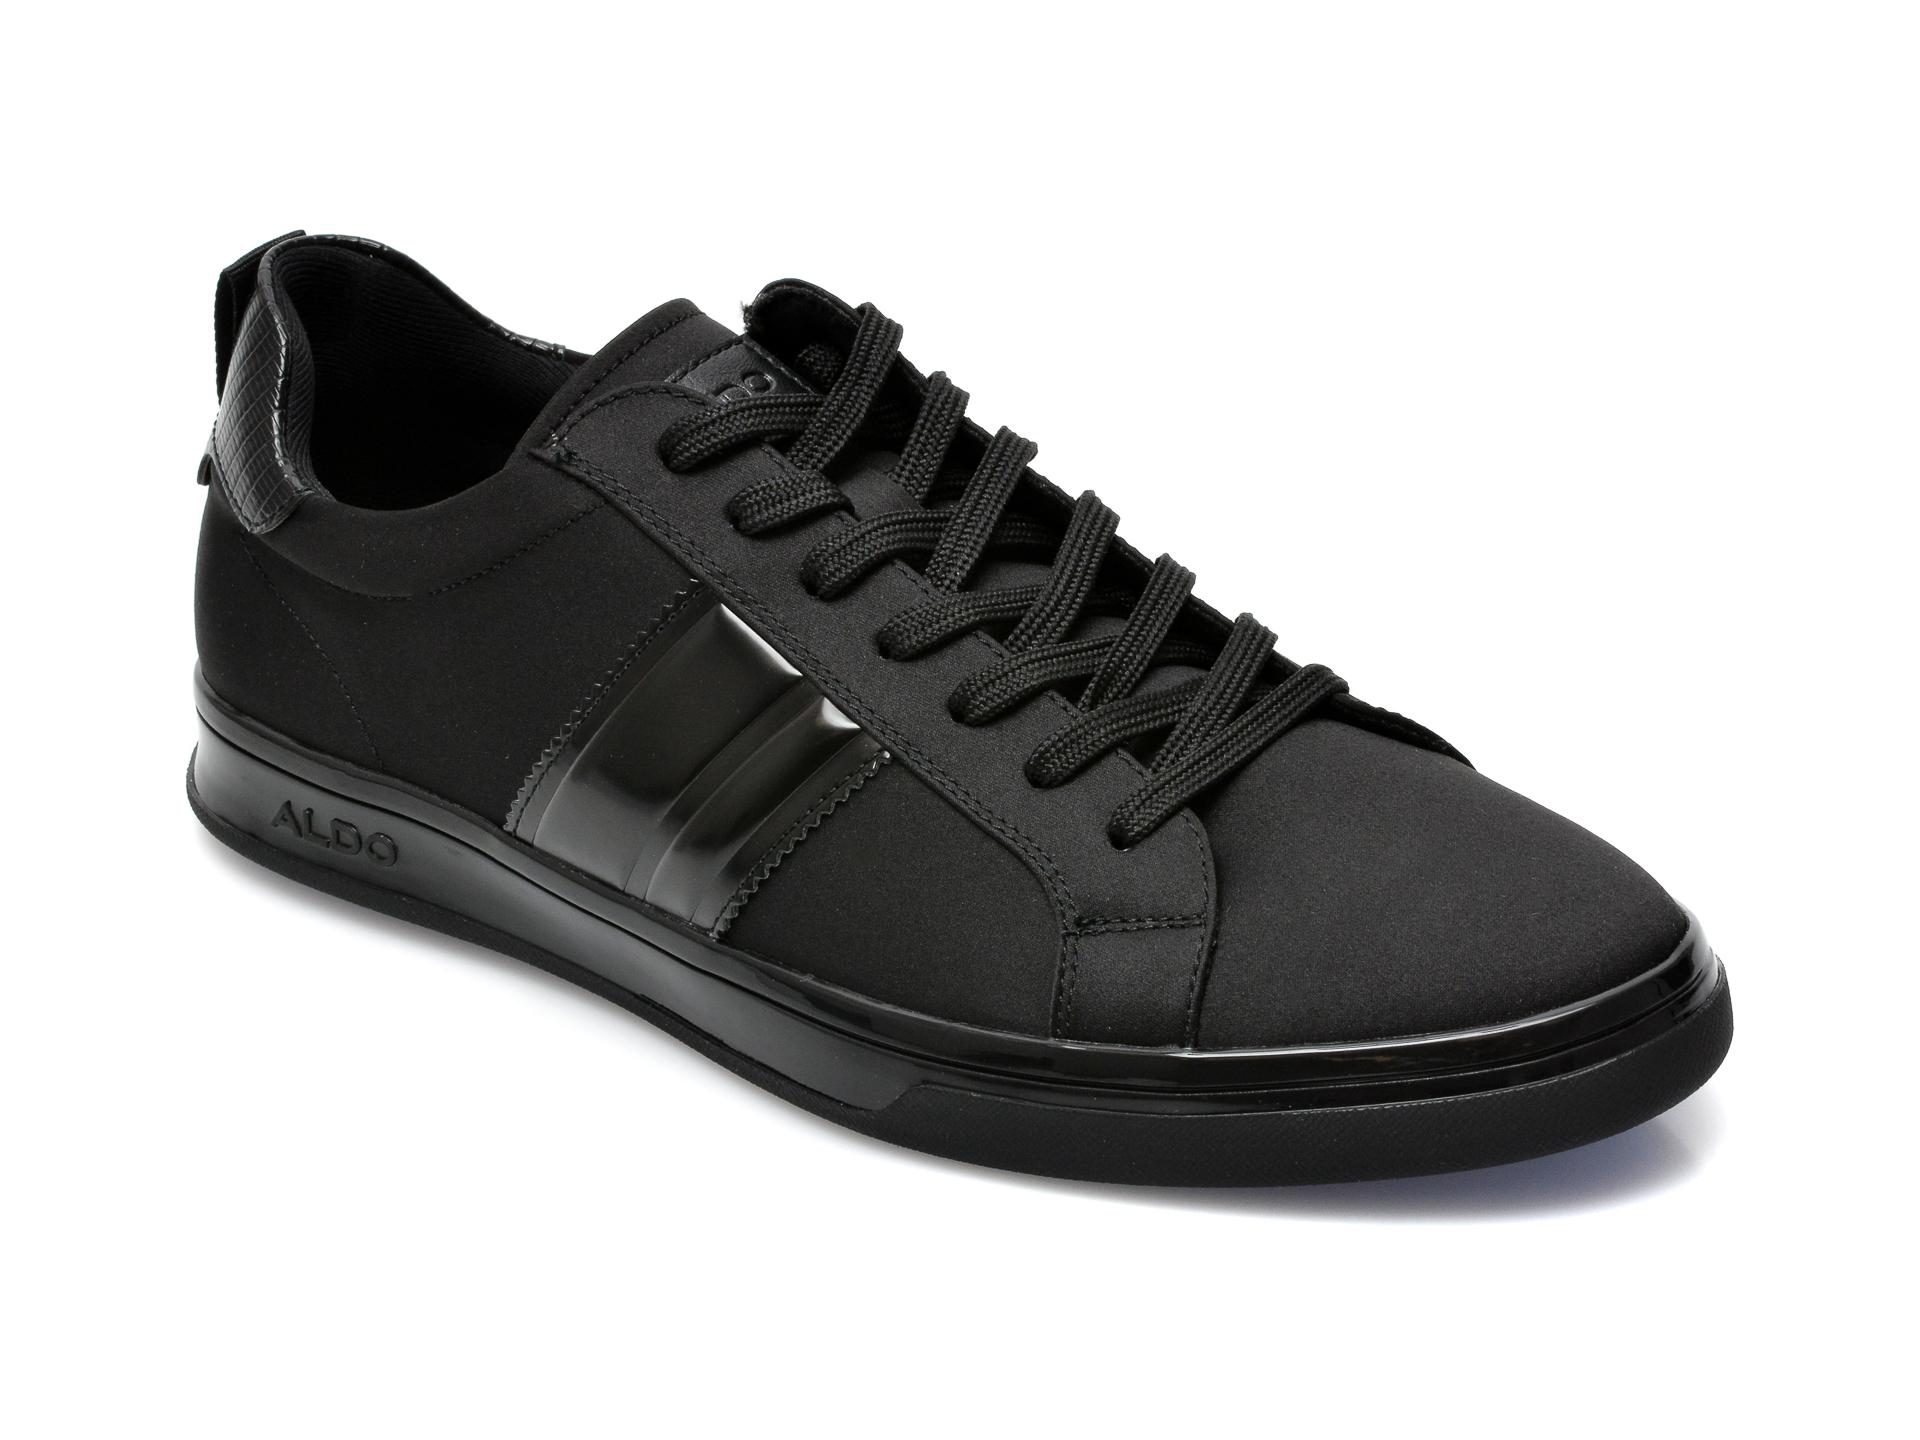 Pantofi ALDO negri, Malisien001, din material textil si piele ecologica imagine otter.ro 2021